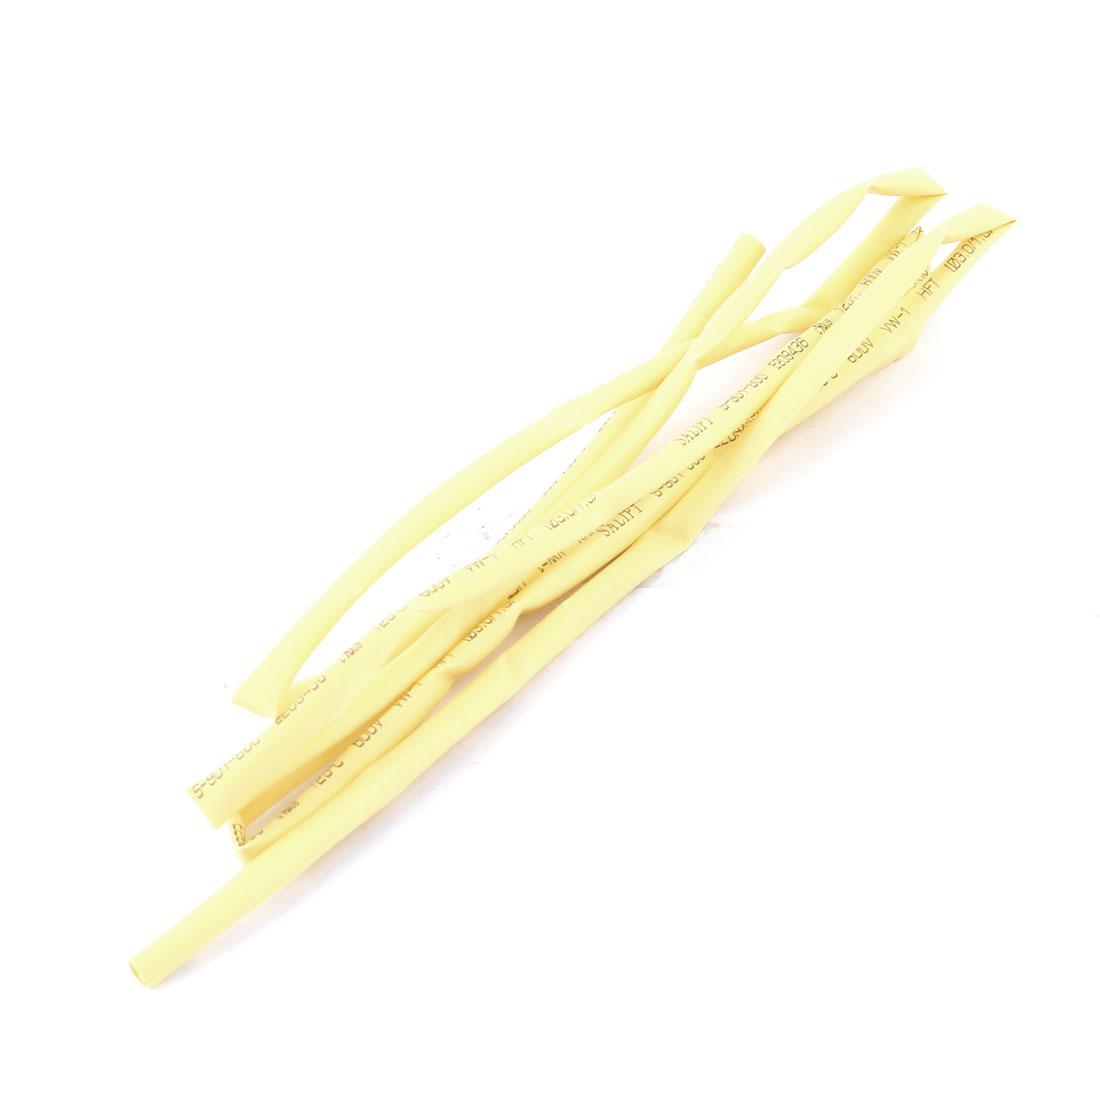 Shrink Ratio 1/2 3mm Yellow Insulated Heat Shrink Tube Shrinkable Tubing Pipe 600V 125C 1m 3.3ft Long